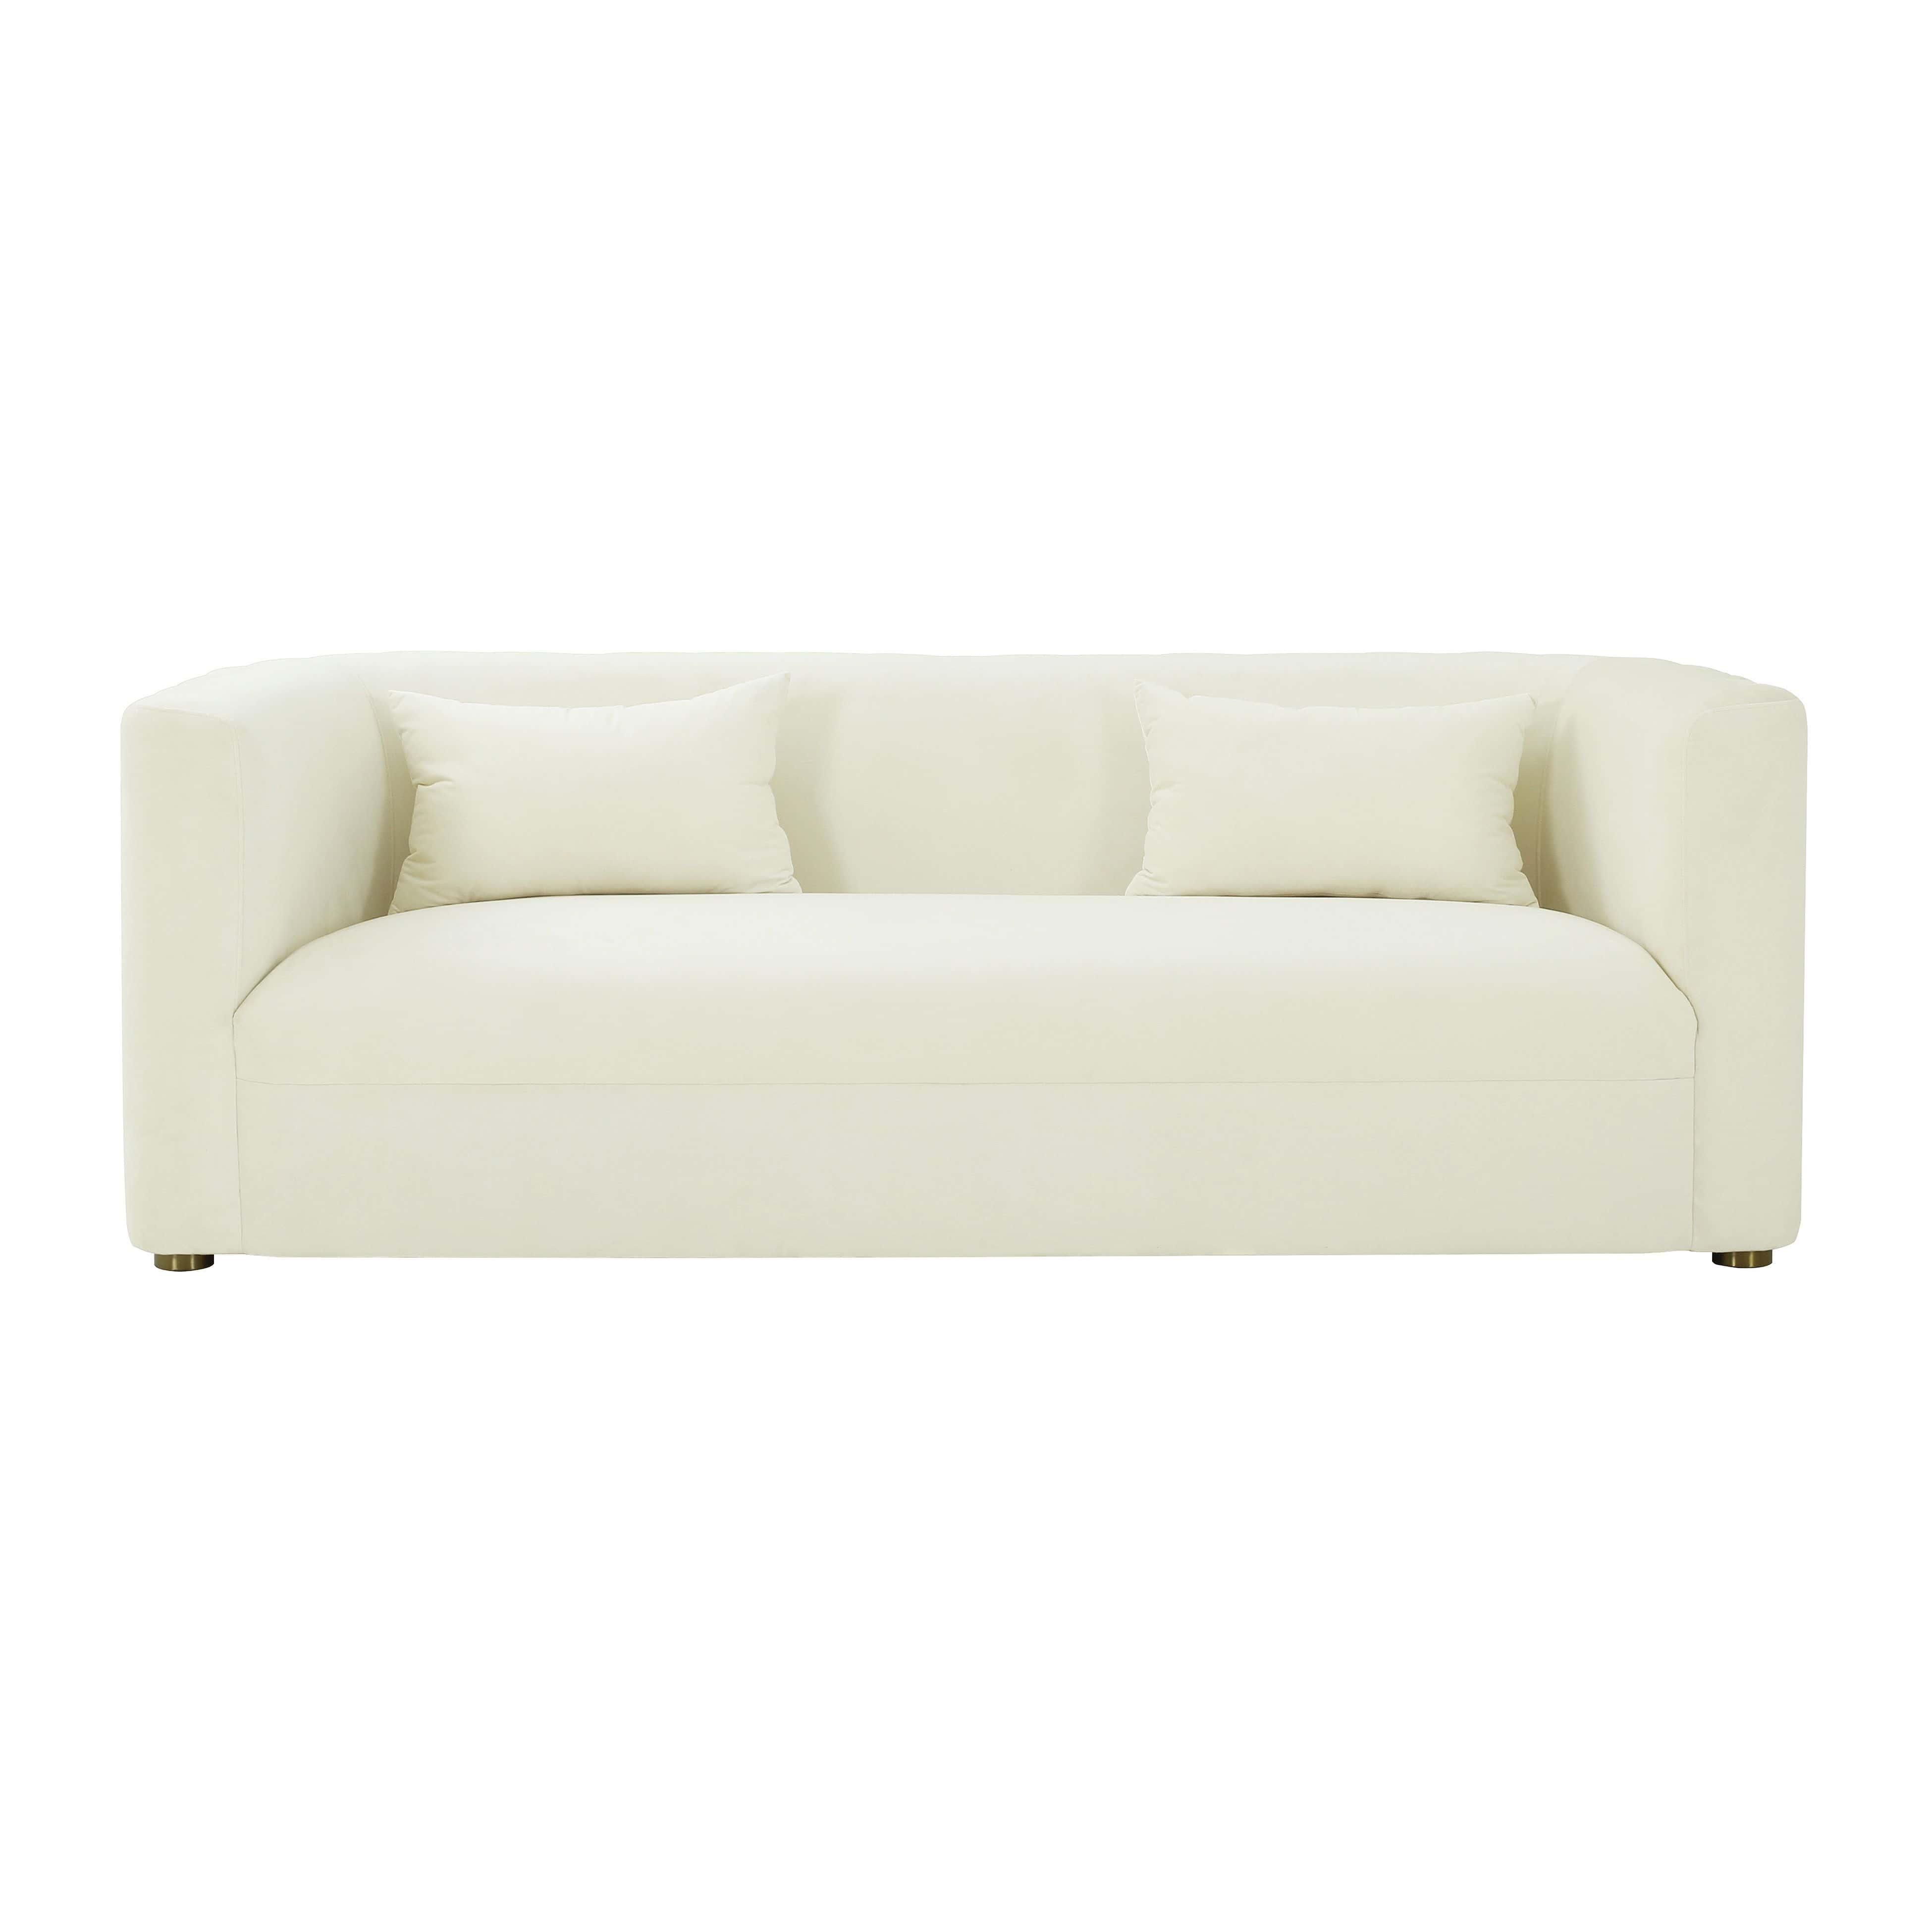 Callie Cream Velvet Sofa By Tov Furniture